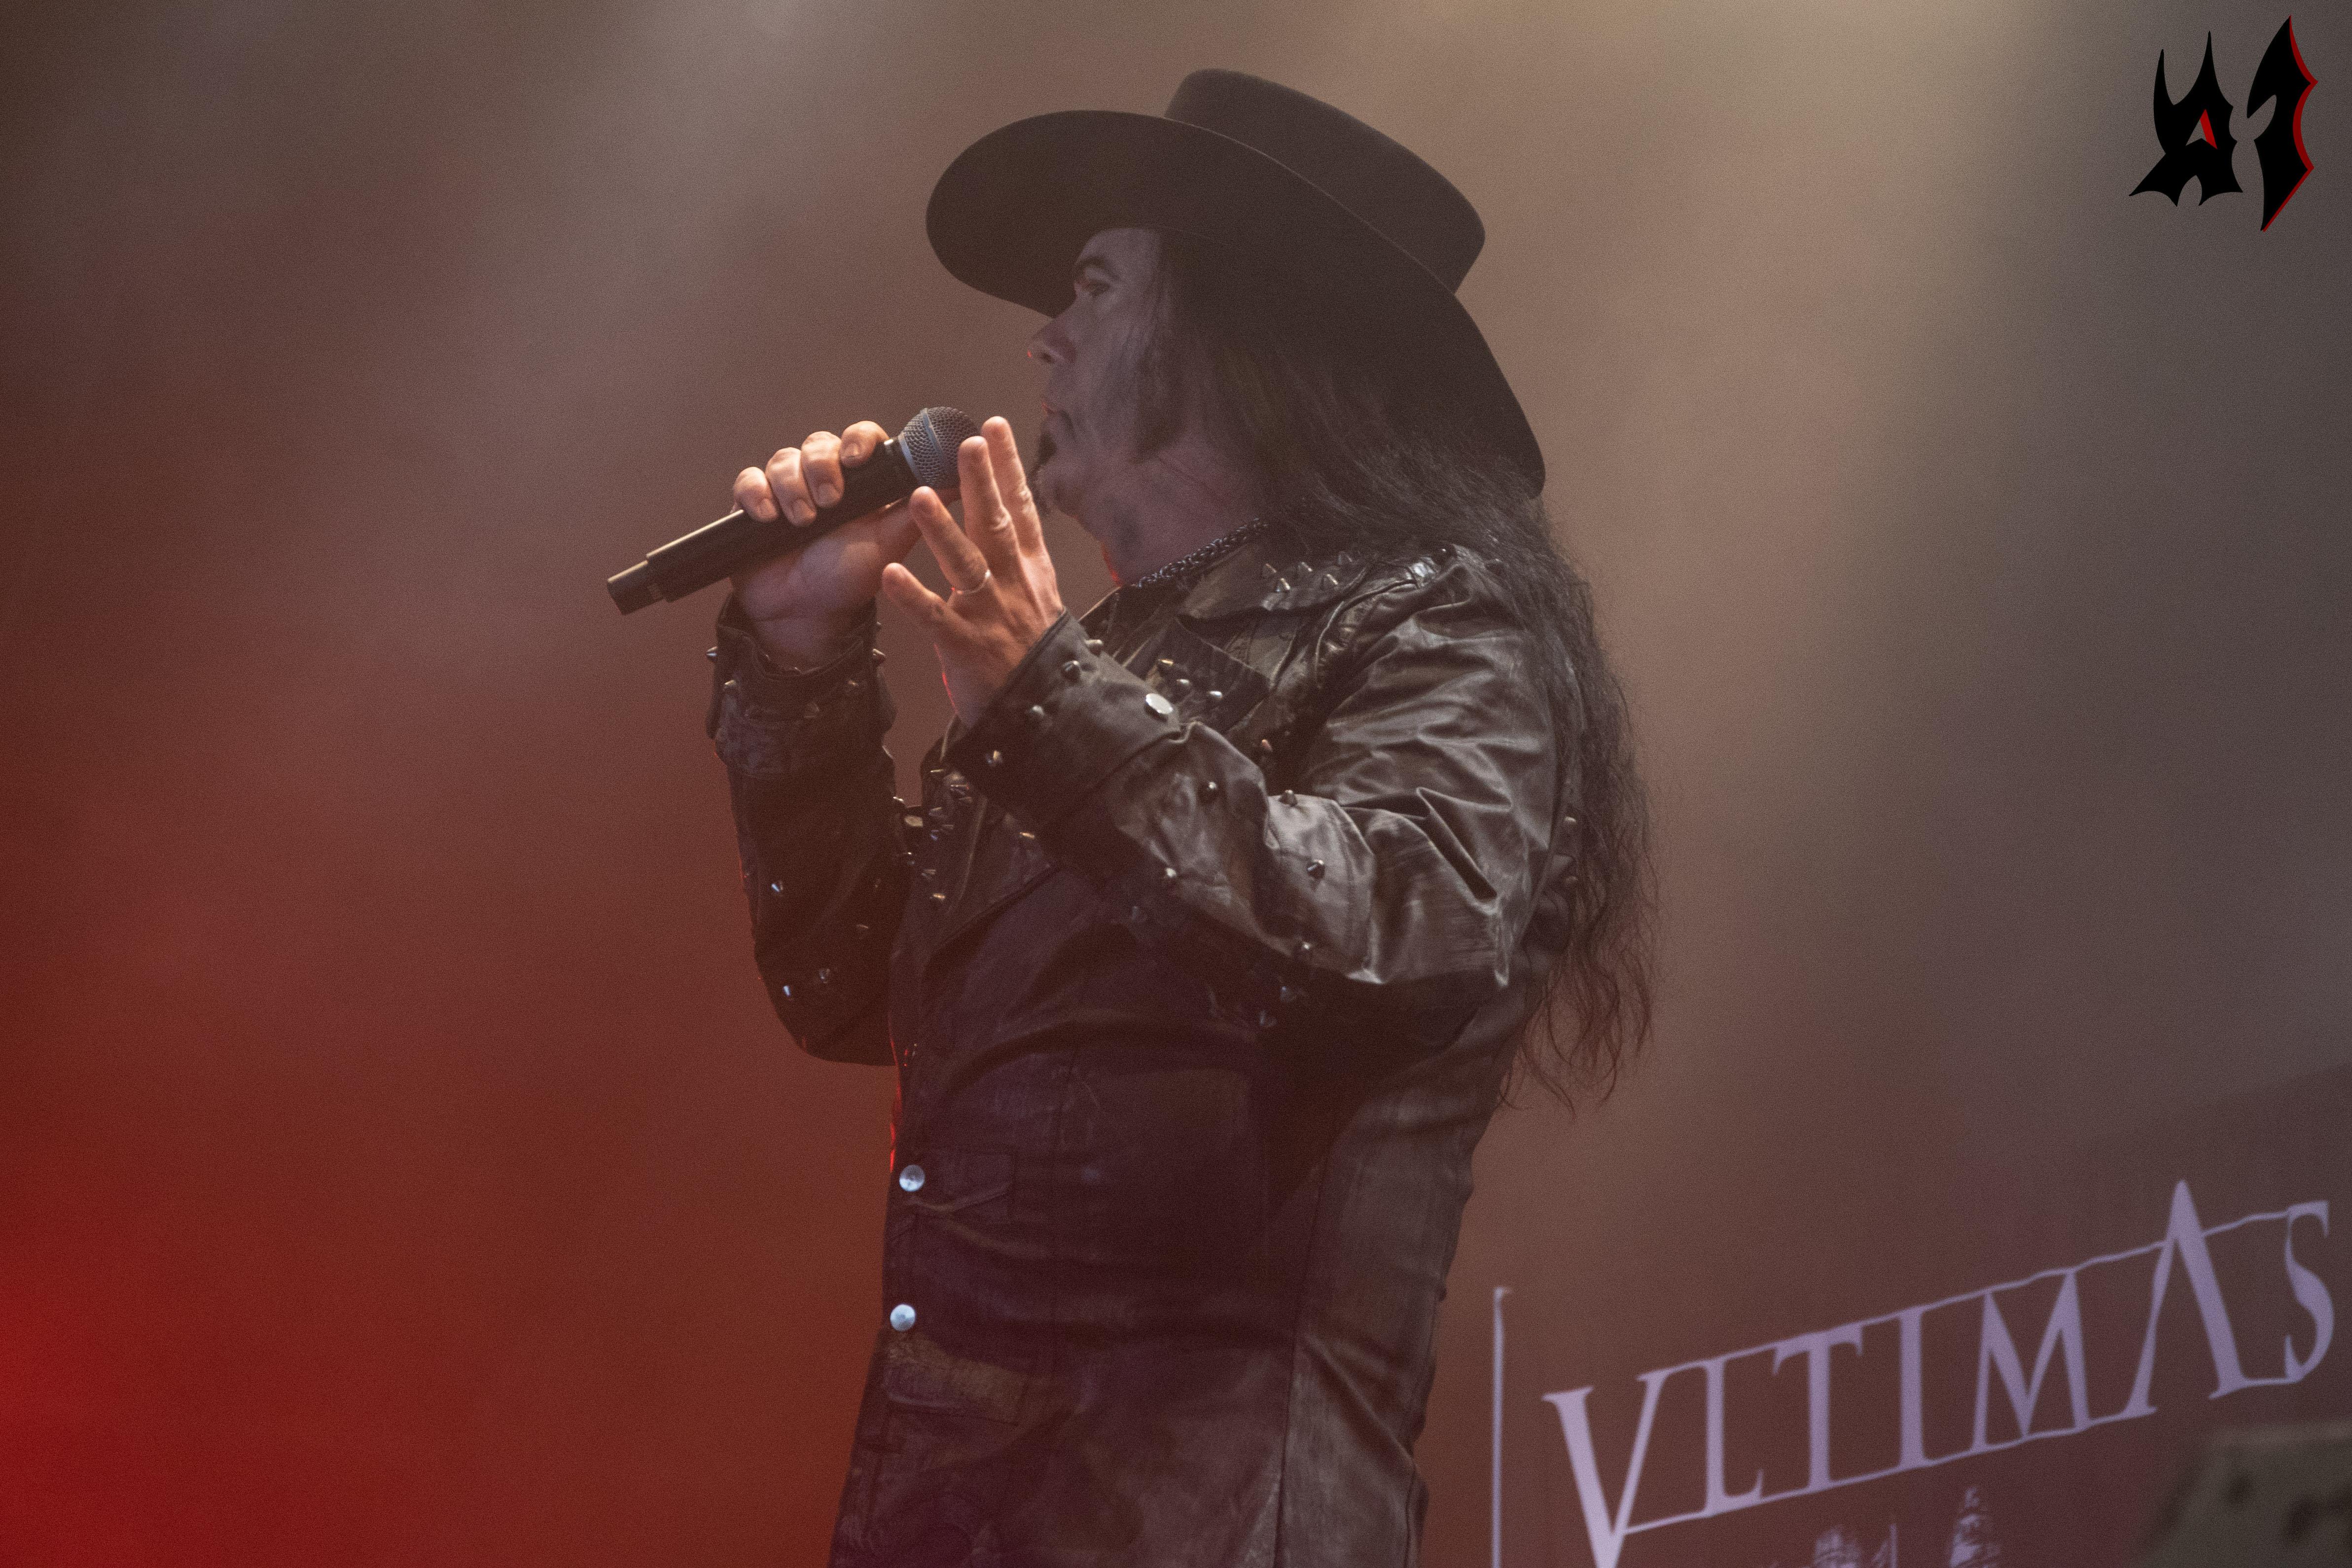 Hellfest - Vltimas - 17